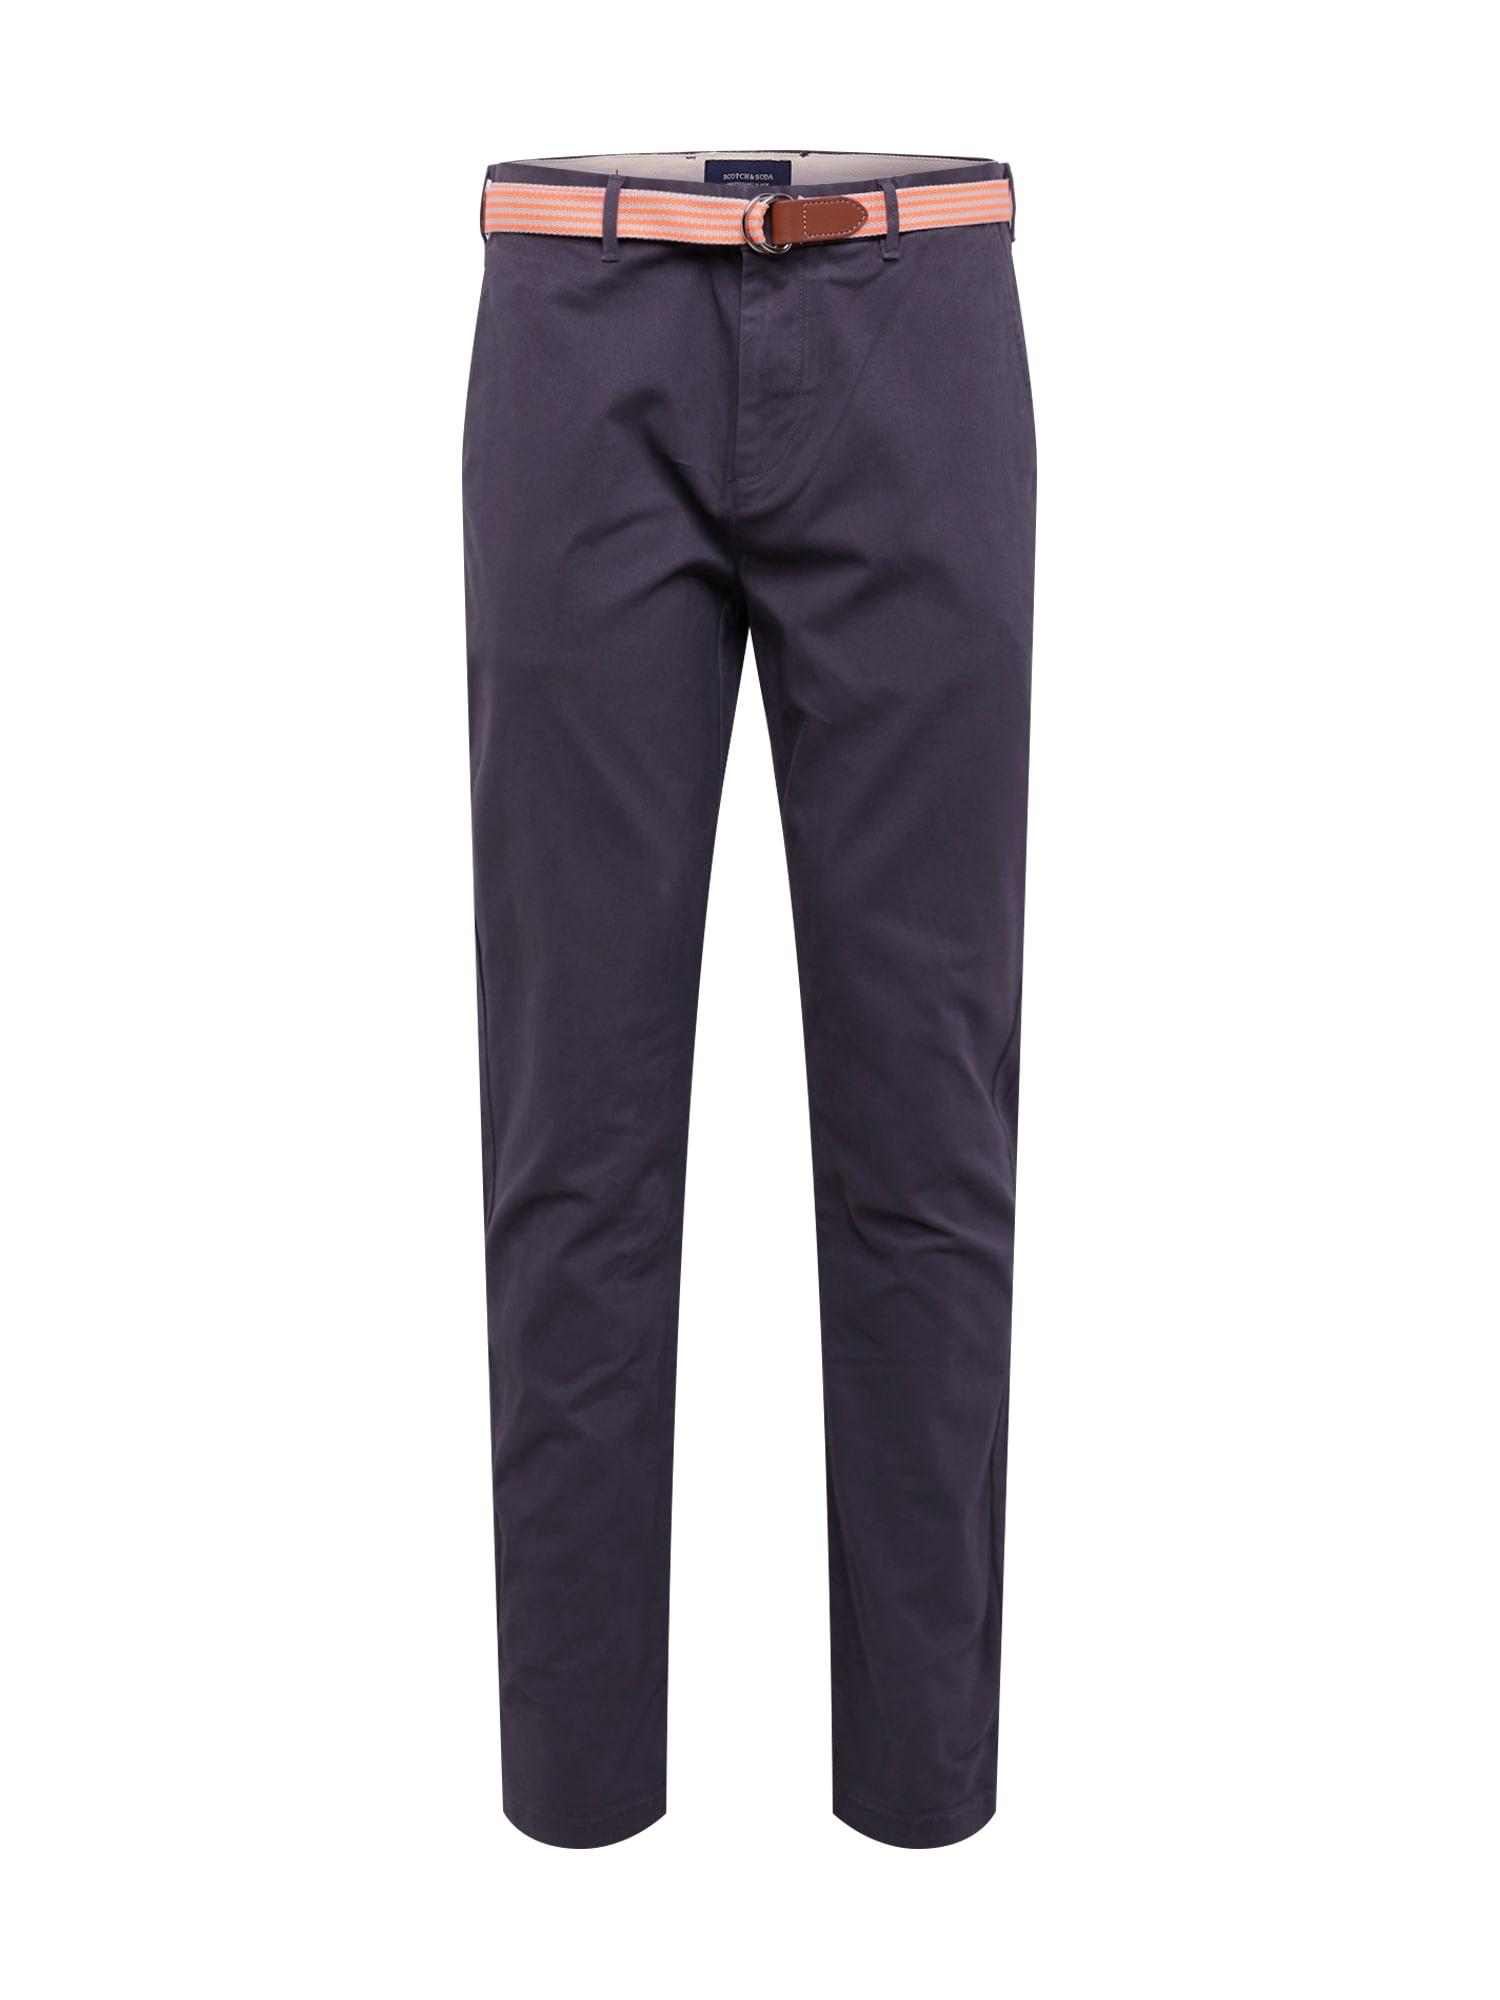 SCOTCH & SODA Chino kalhoty 'Stretch Stuart with belt'  šedá